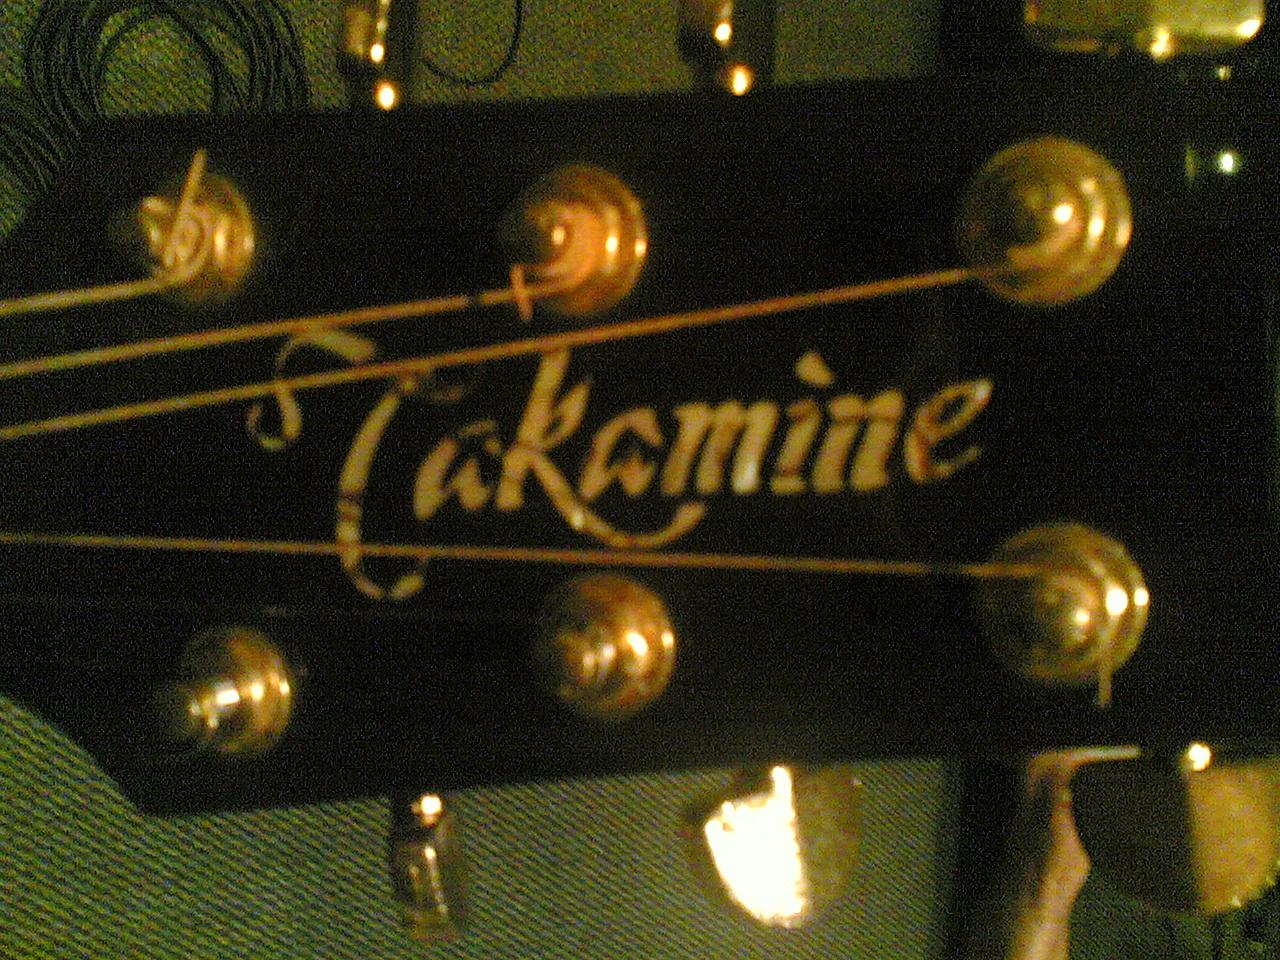 Takamine...Lionel's guitar...